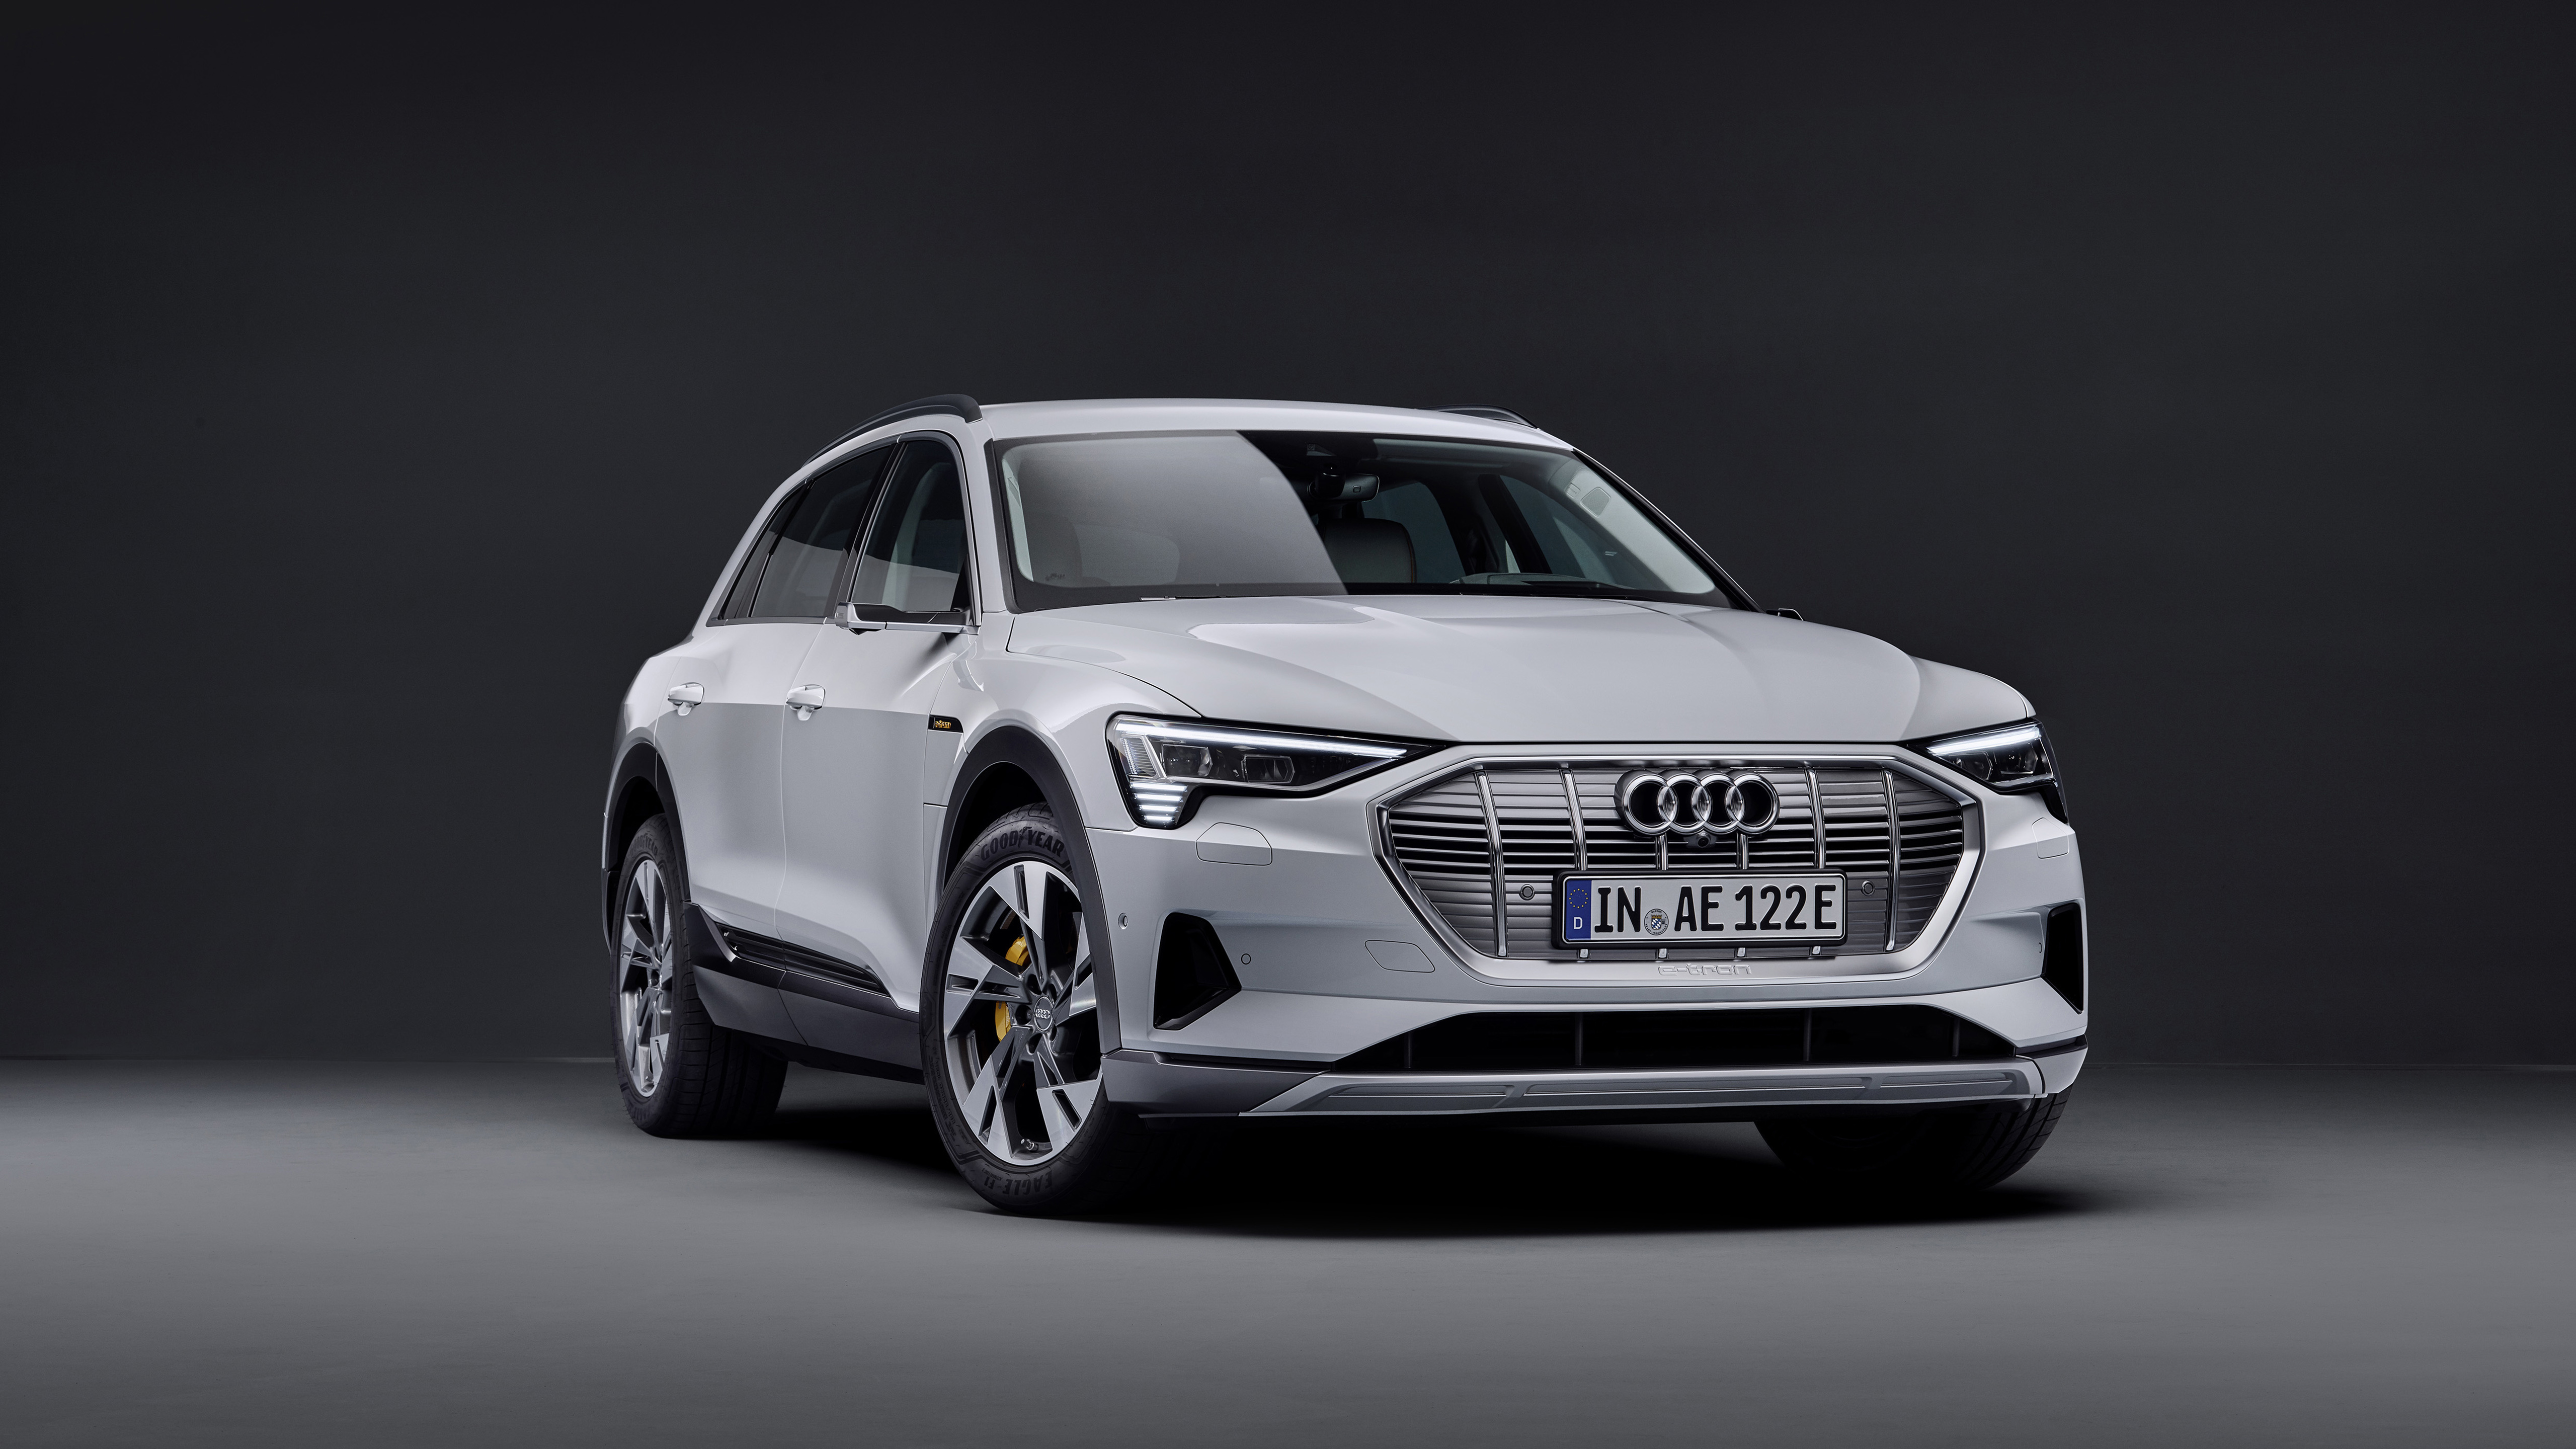 Audi E Tron 50 Quattro 2019 4k 4 Wallpaper Hd Car Wallpapers Id 12953